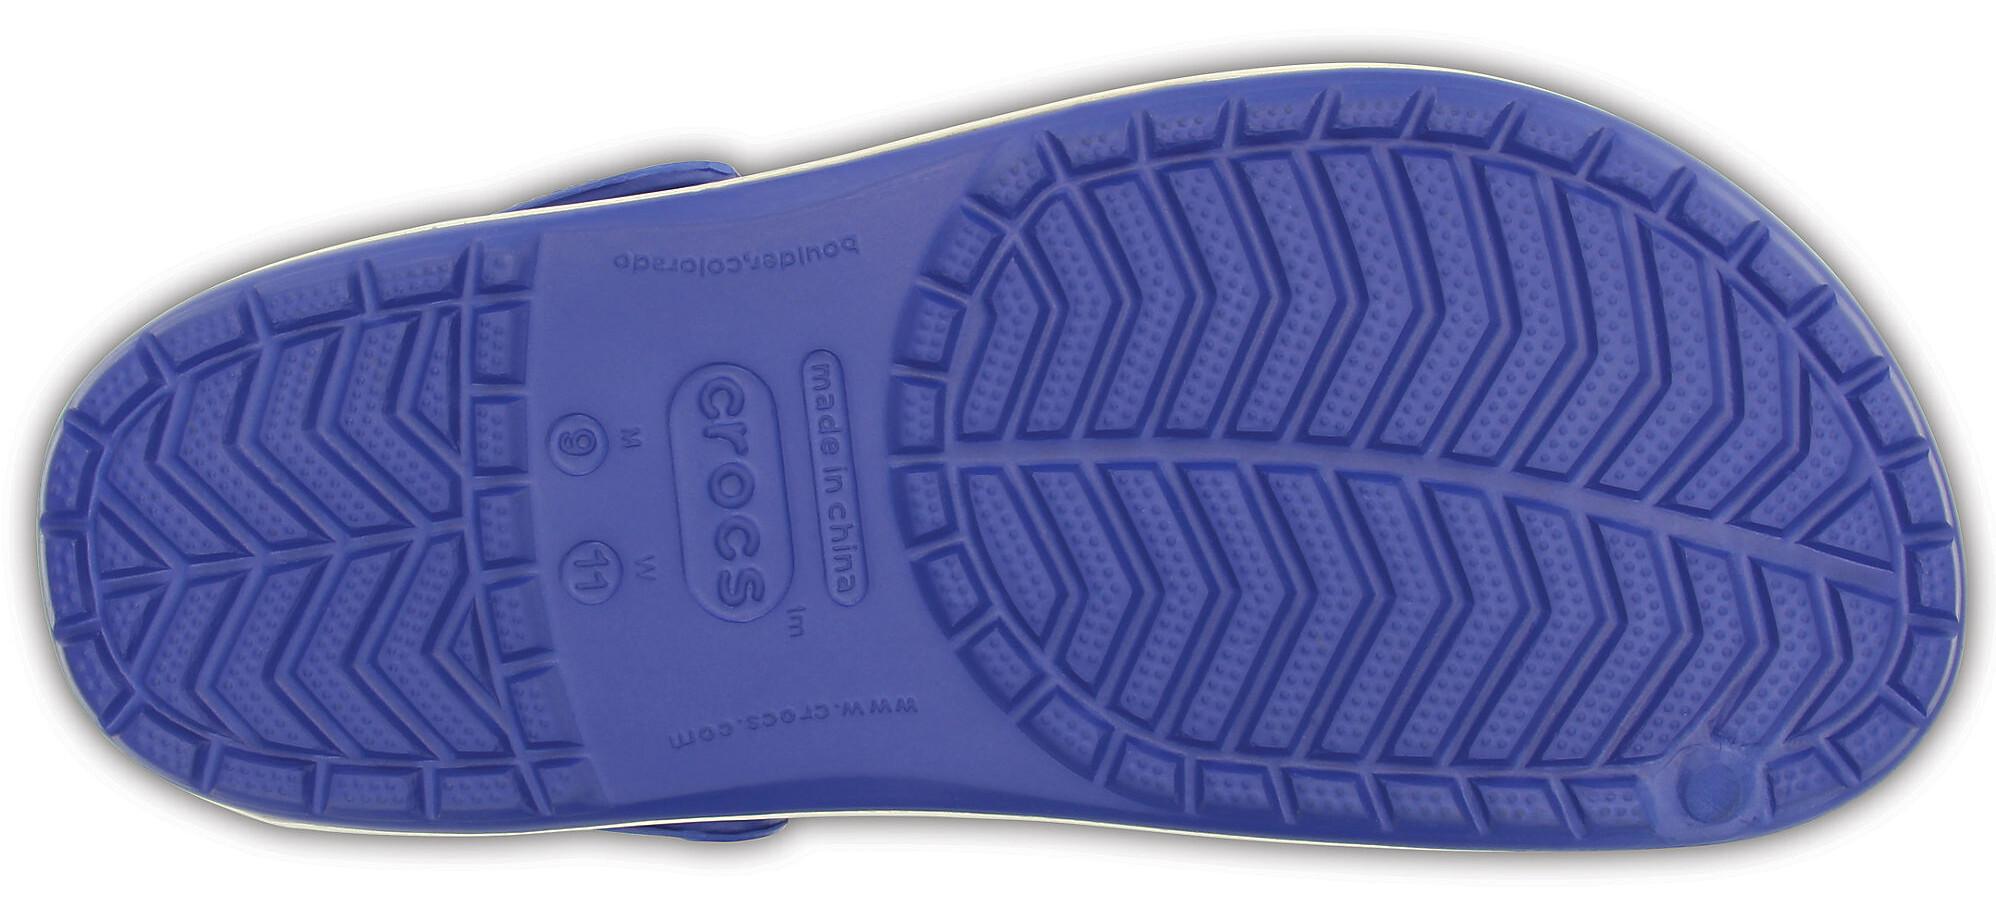 d58ba230f Crocs Crocband Clogs Unisex